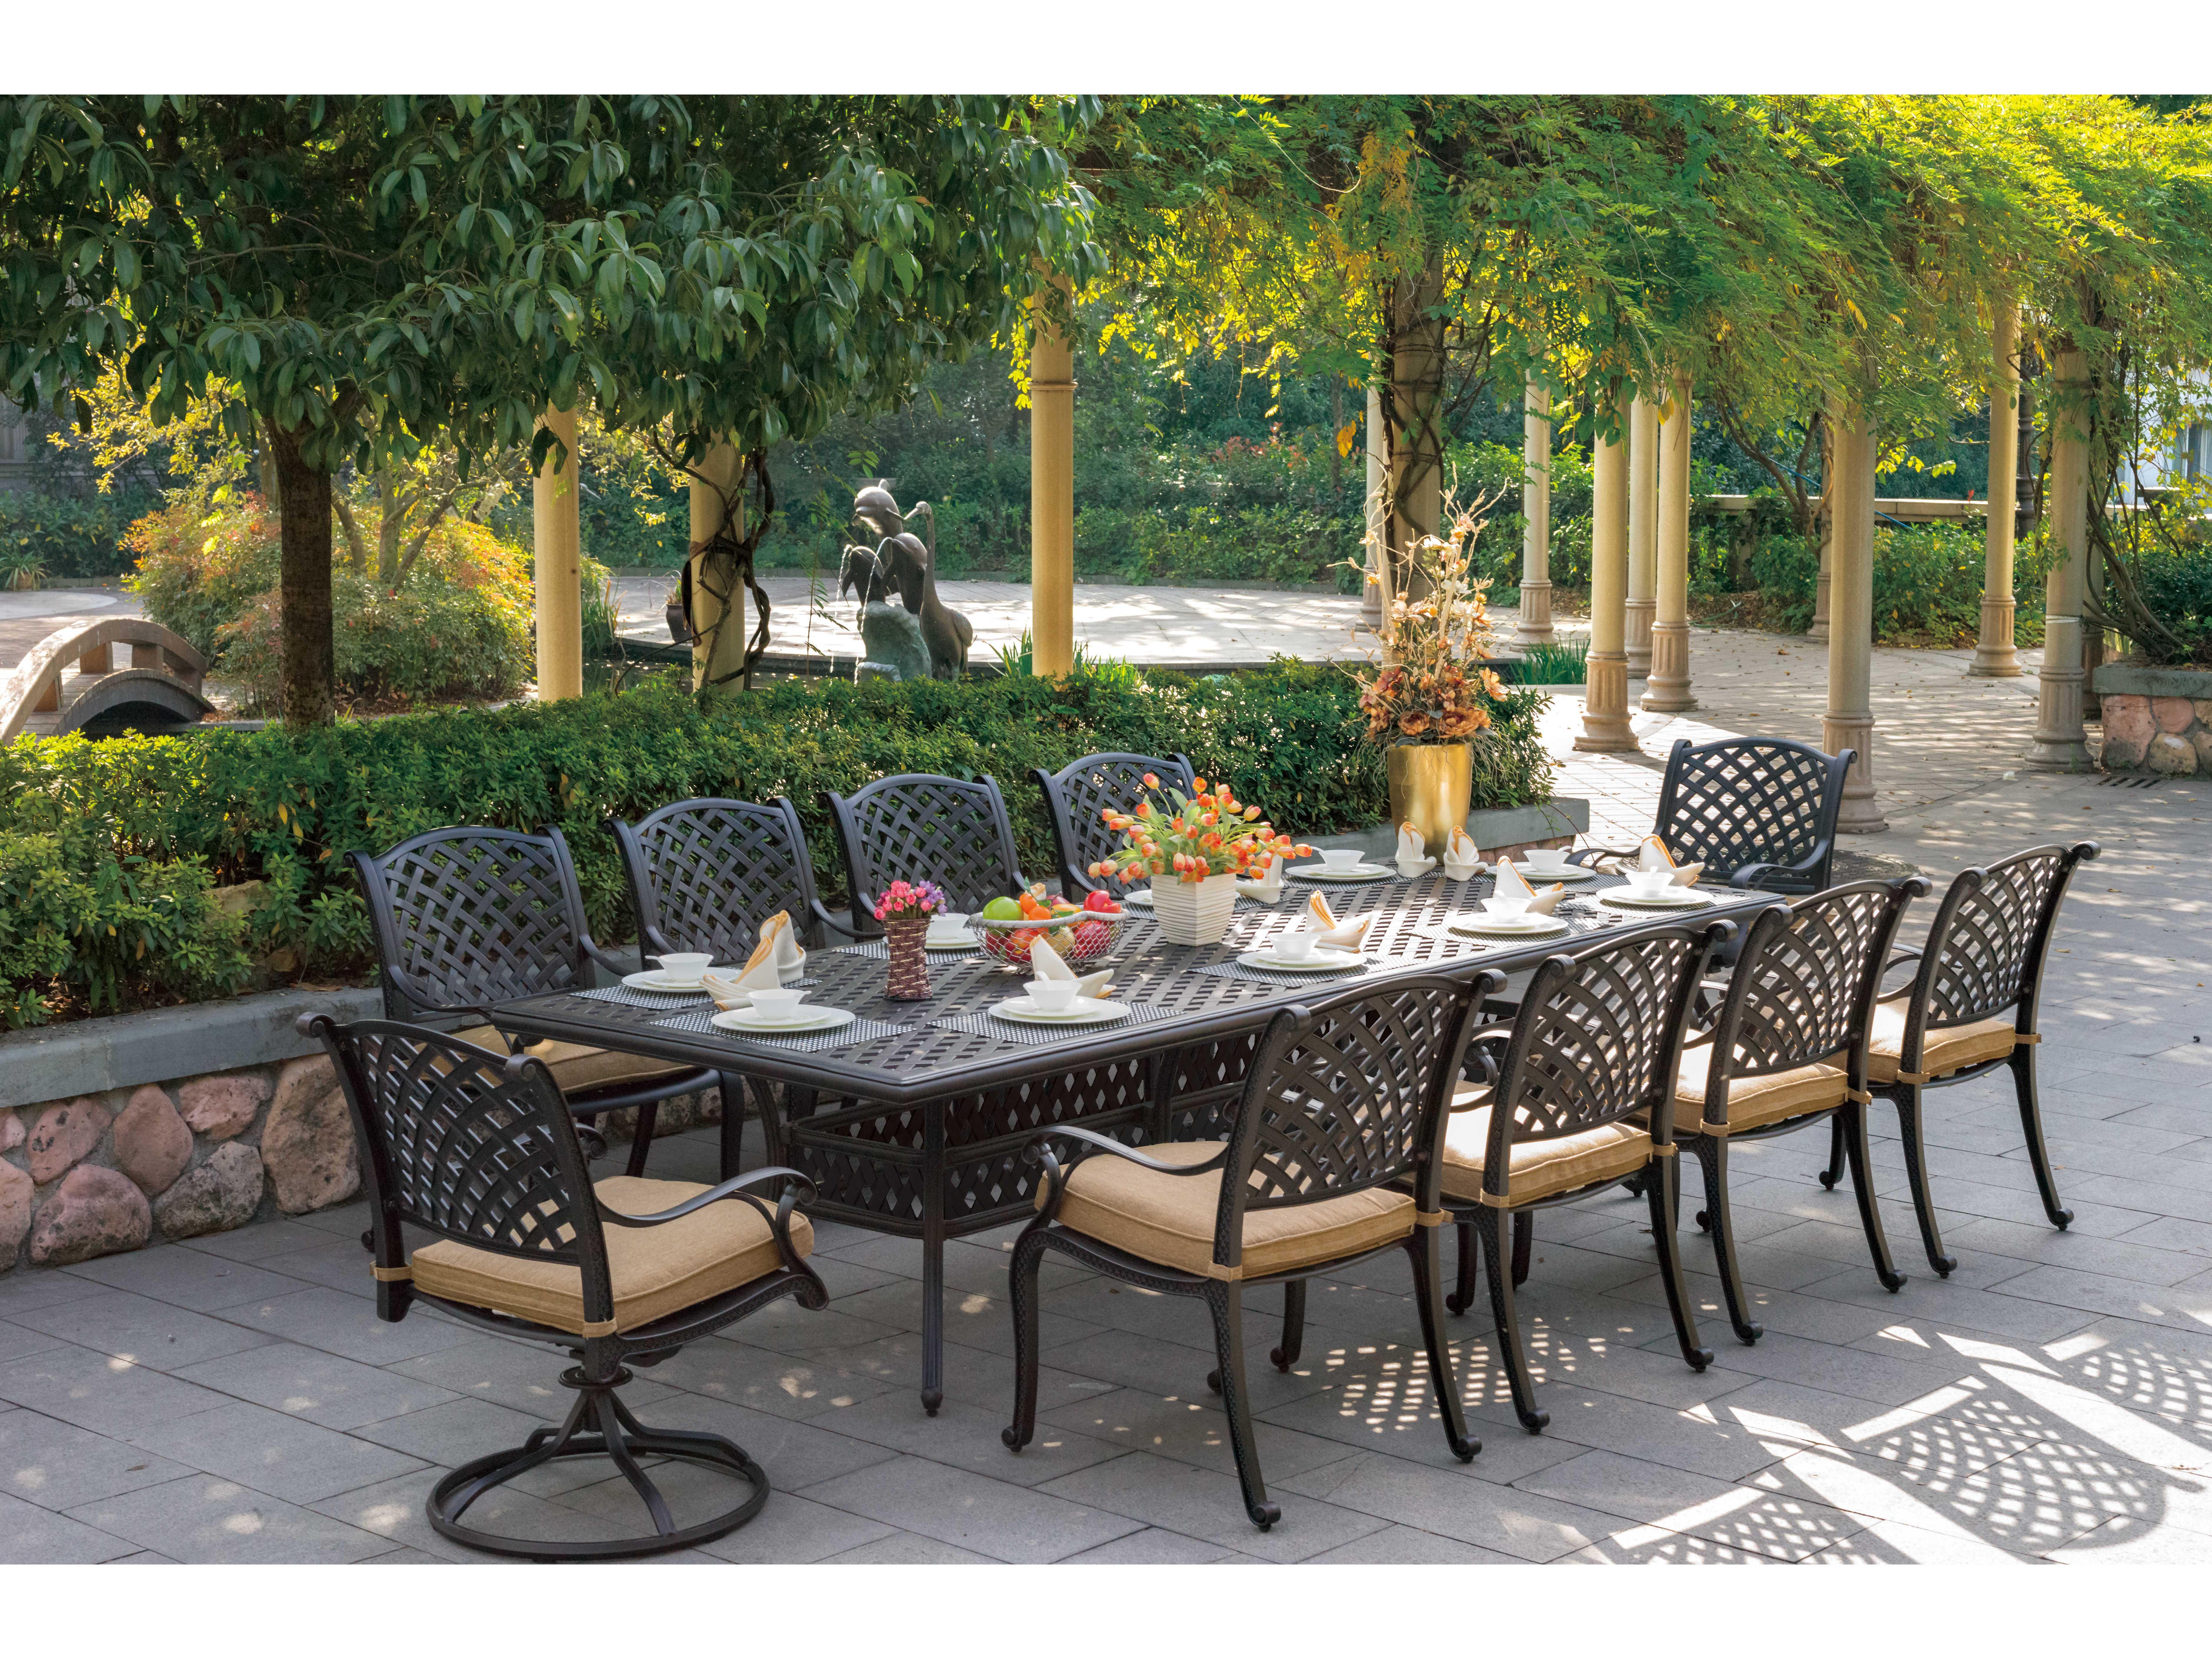 View · Darlee Outdoor Living Series 30 Cast Aluminum Antique Bronze 120 X  46 Rectangular Dining Table